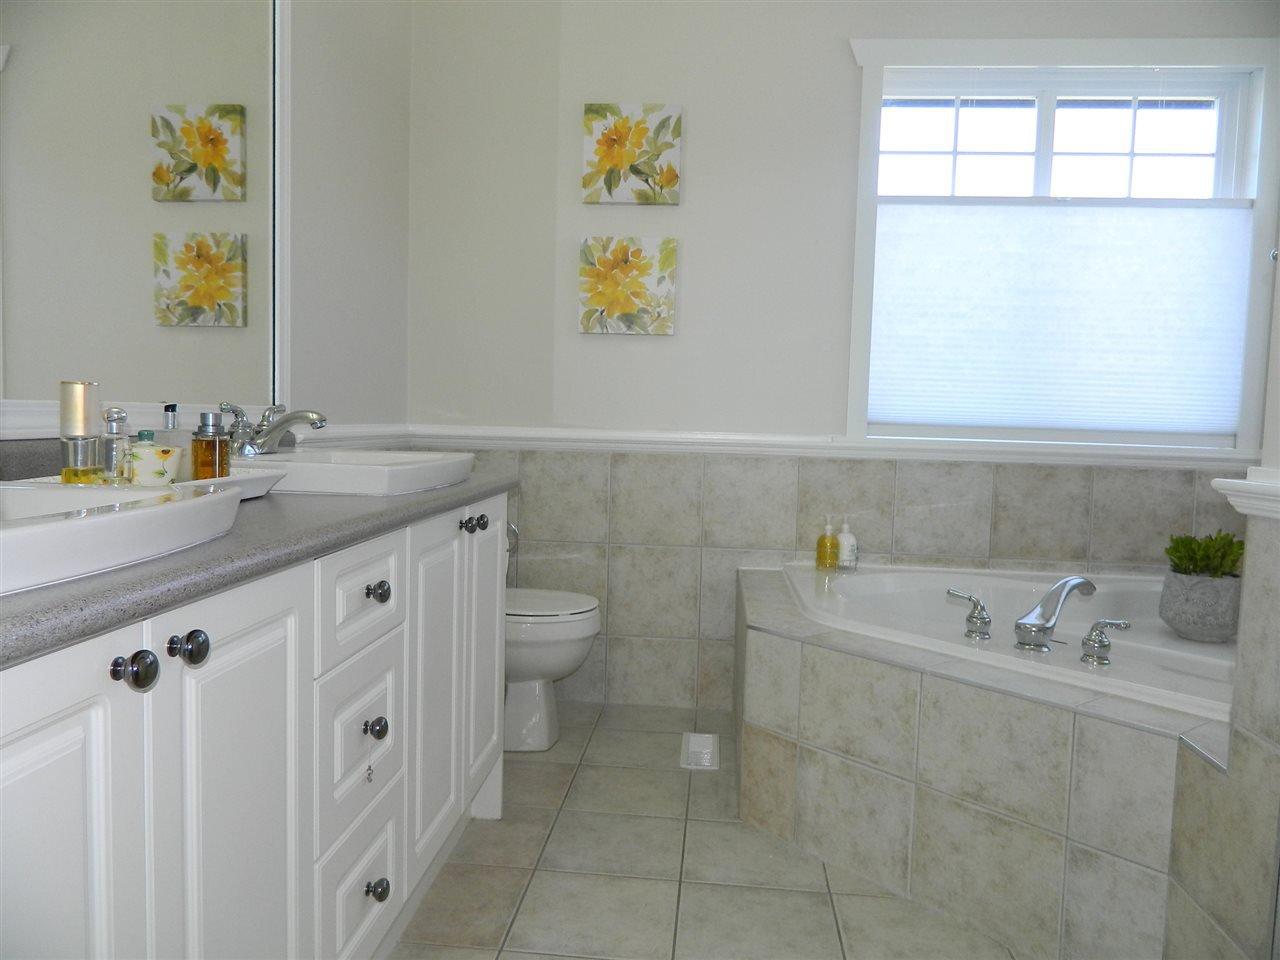 Photo 11: Photos: 24332 104 AVENUE in Maple Ridge: Albion House for sale : MLS®# R2051414